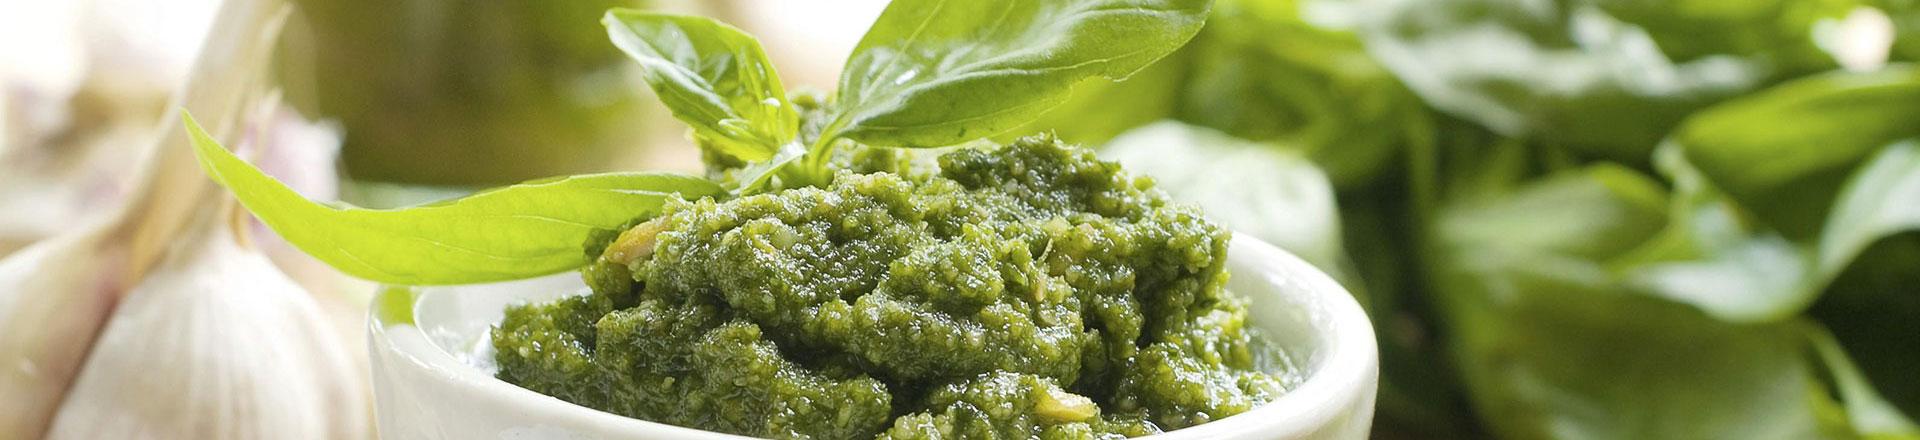 Erregi s.r.l. Italian Food